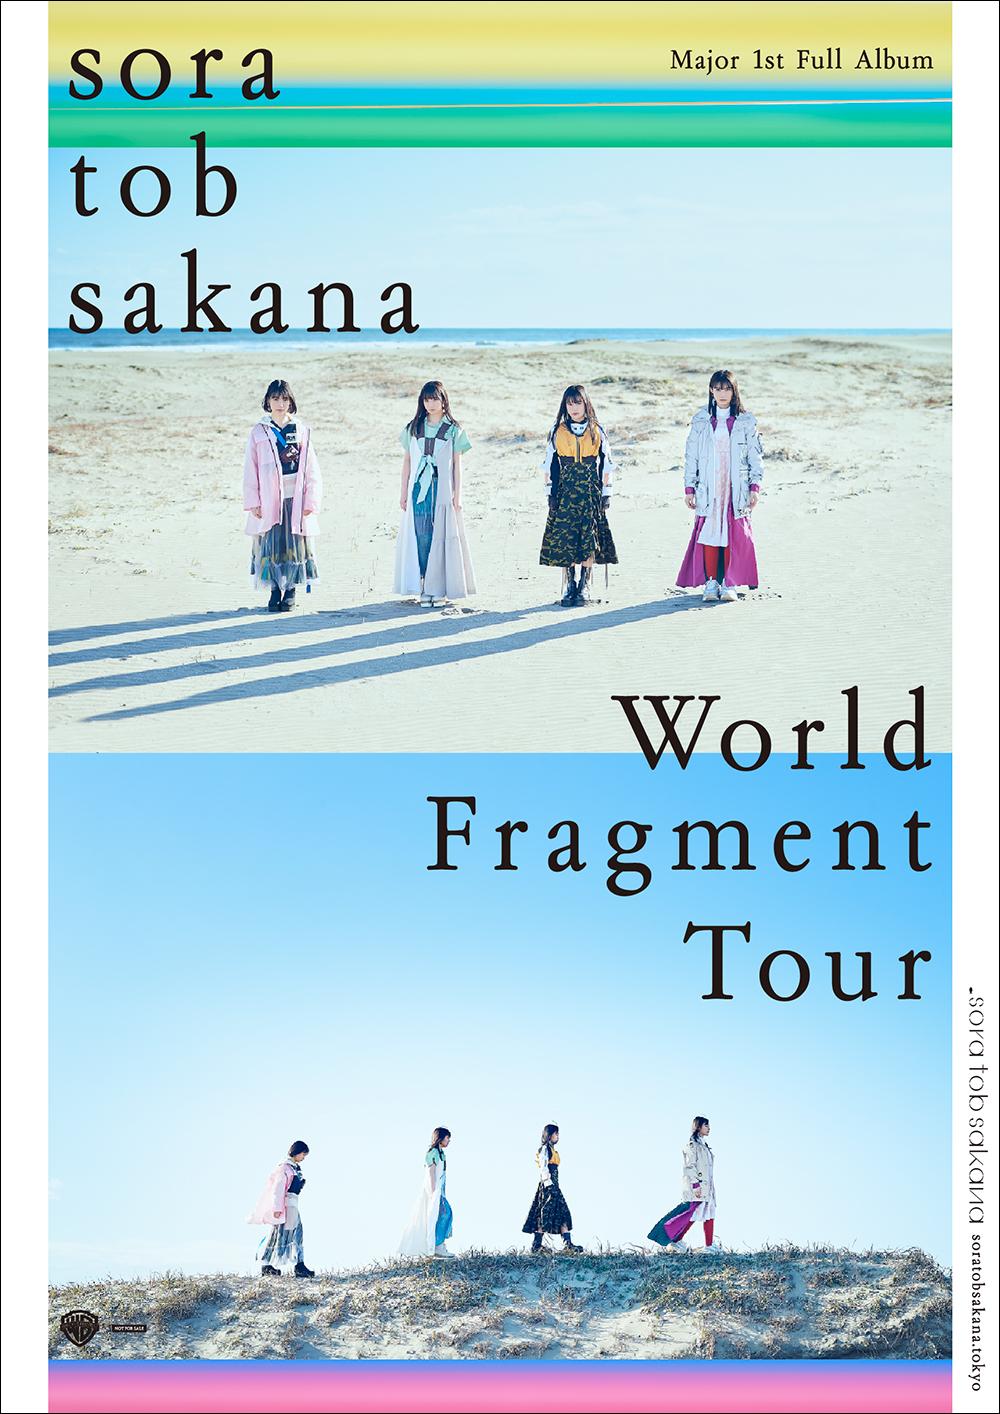 sora tob sakana「World Fragment Tour」Poster